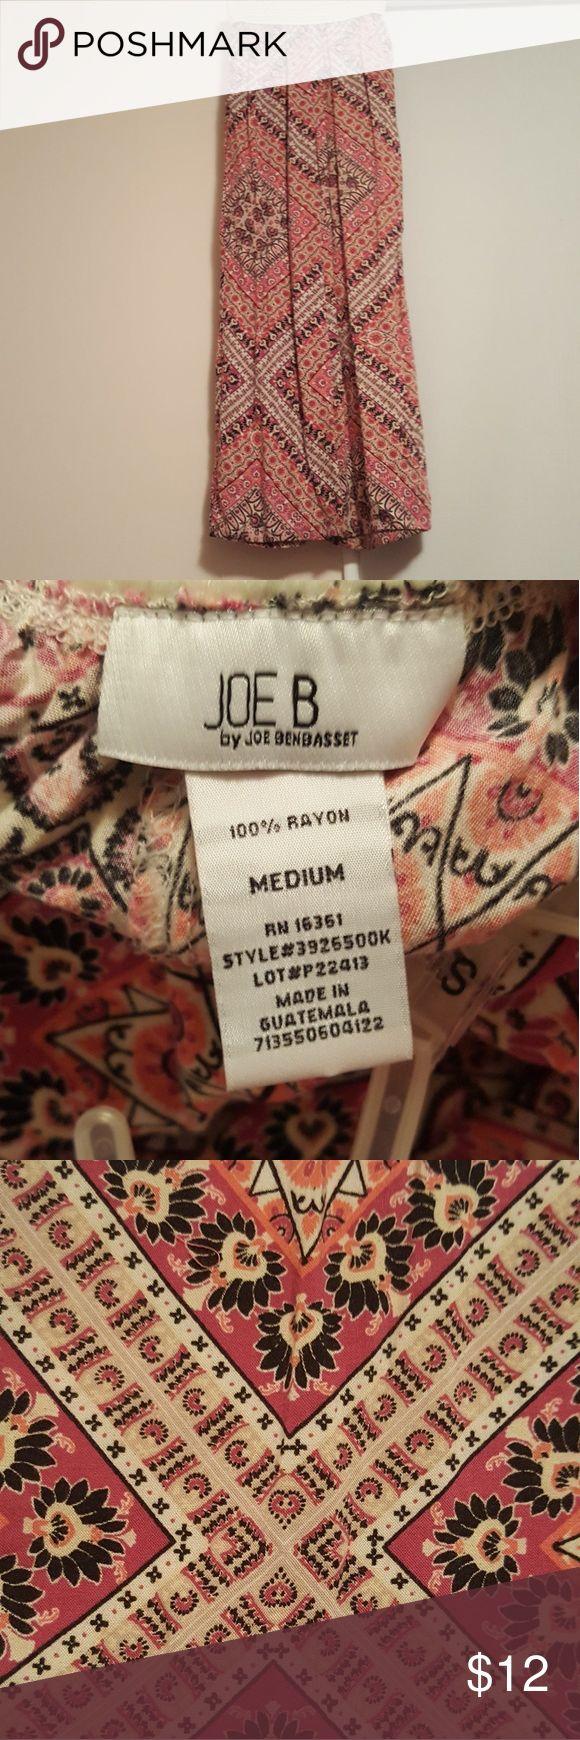 "Aztec Print Pants LOVE this fabric! Super comfy pants w/ pockets. Great conditon  - minimal wear. 30"" inseam. Joe B Pants Wide Leg"